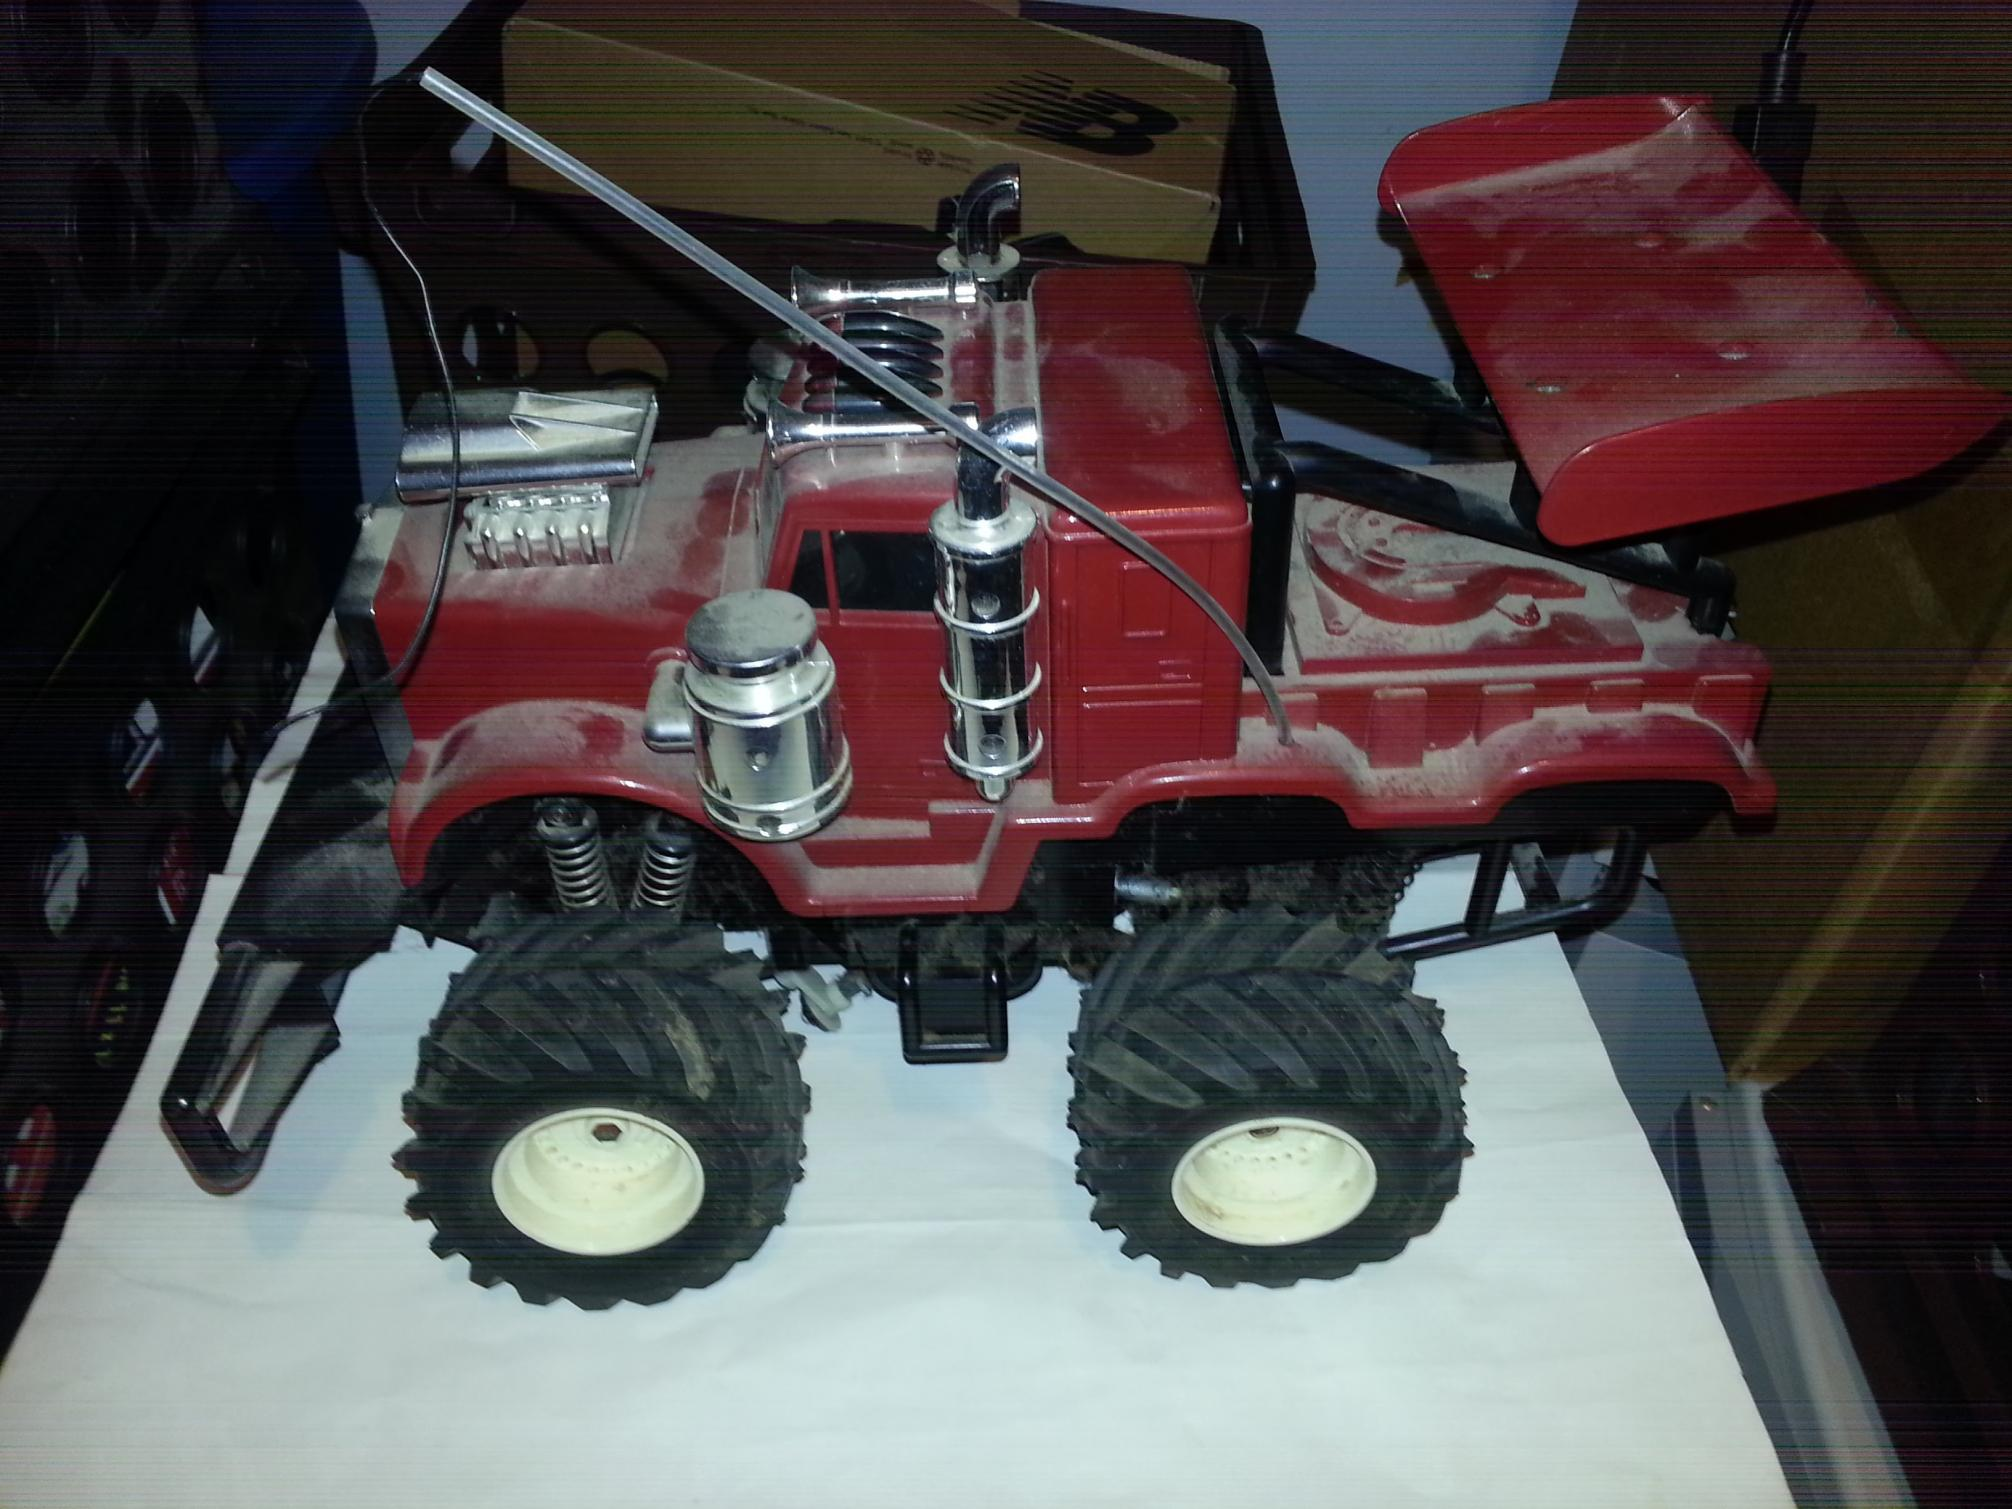 Help identifying vintage Radio Shack RC truck - R/C Tech Forums